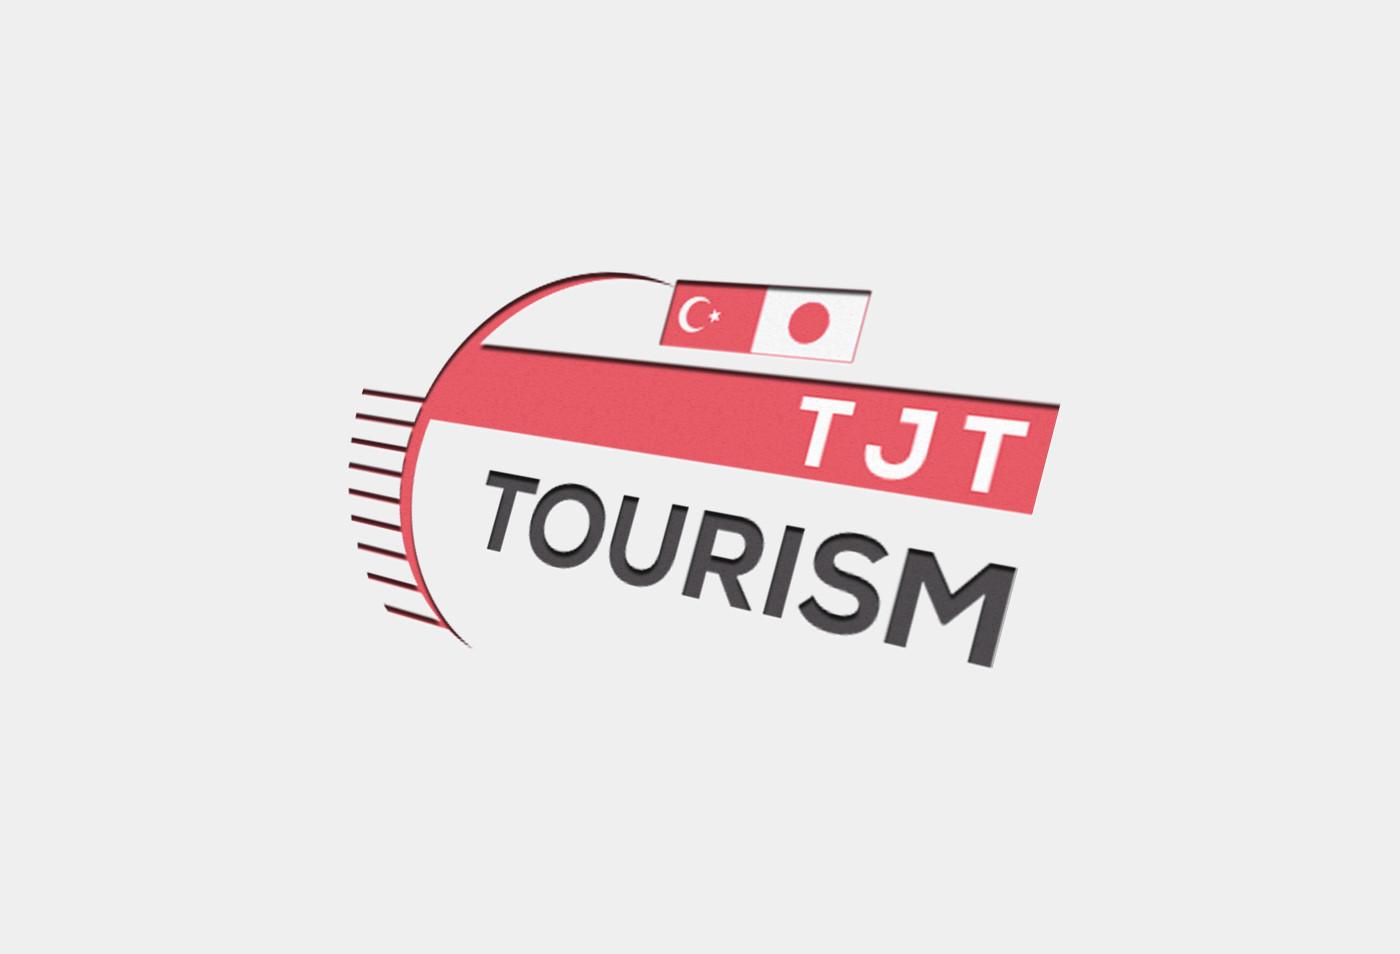 TJT TOURISM